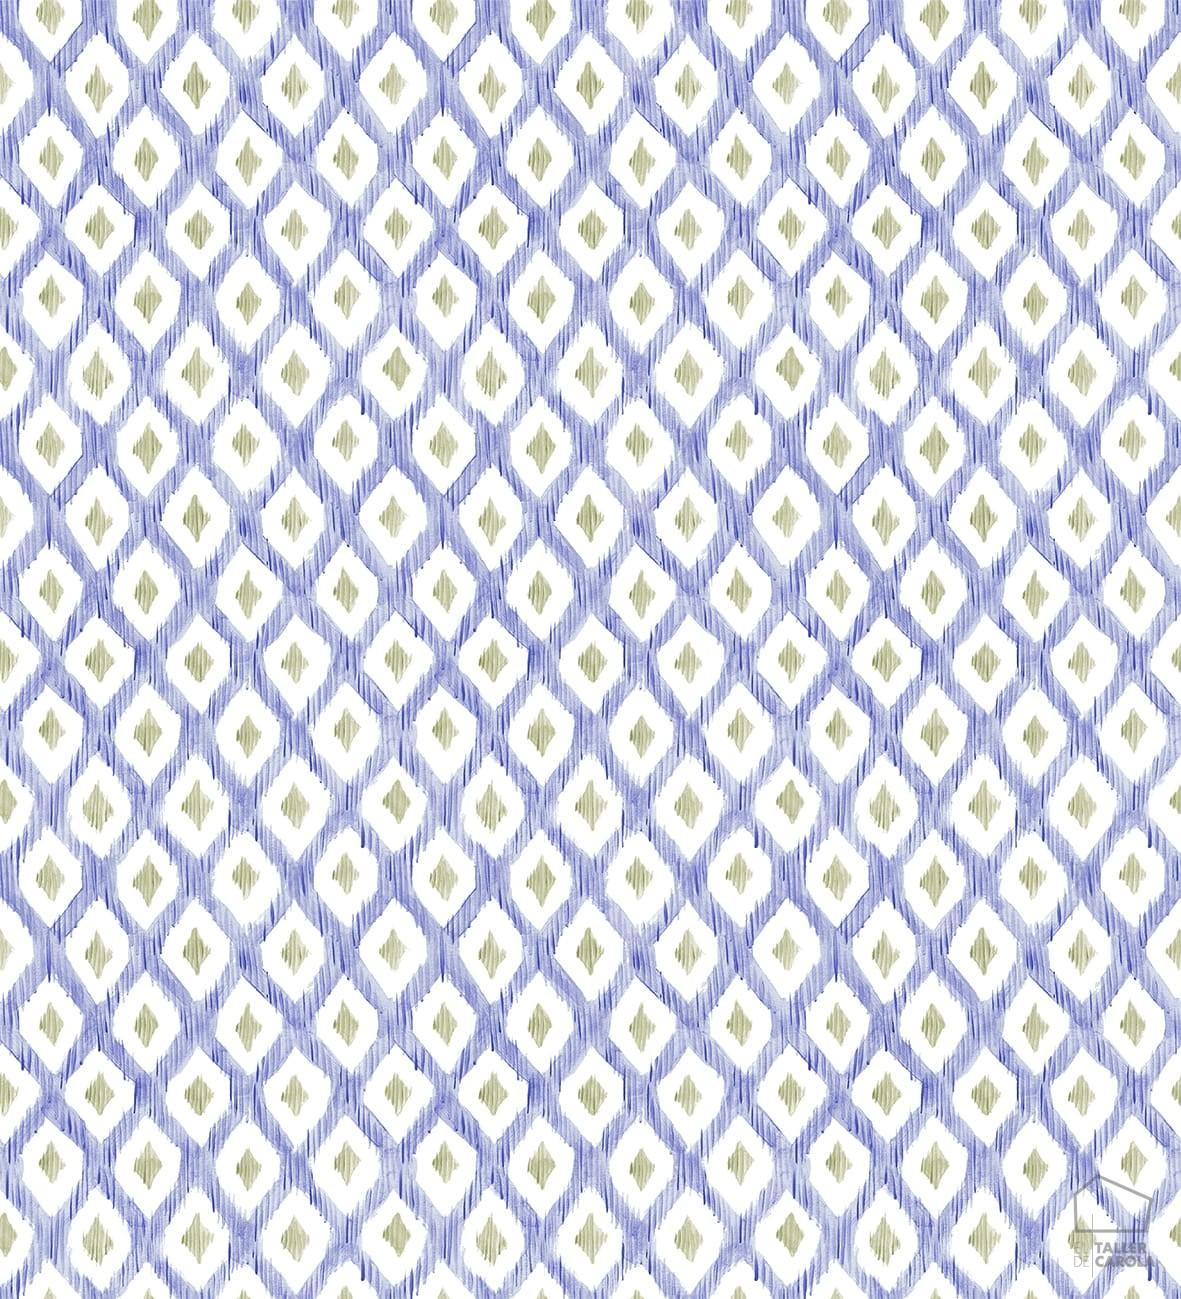 069ind_ani_pri_indYSP0121_papeles_pintados_estampados_ikat_azul_indigo